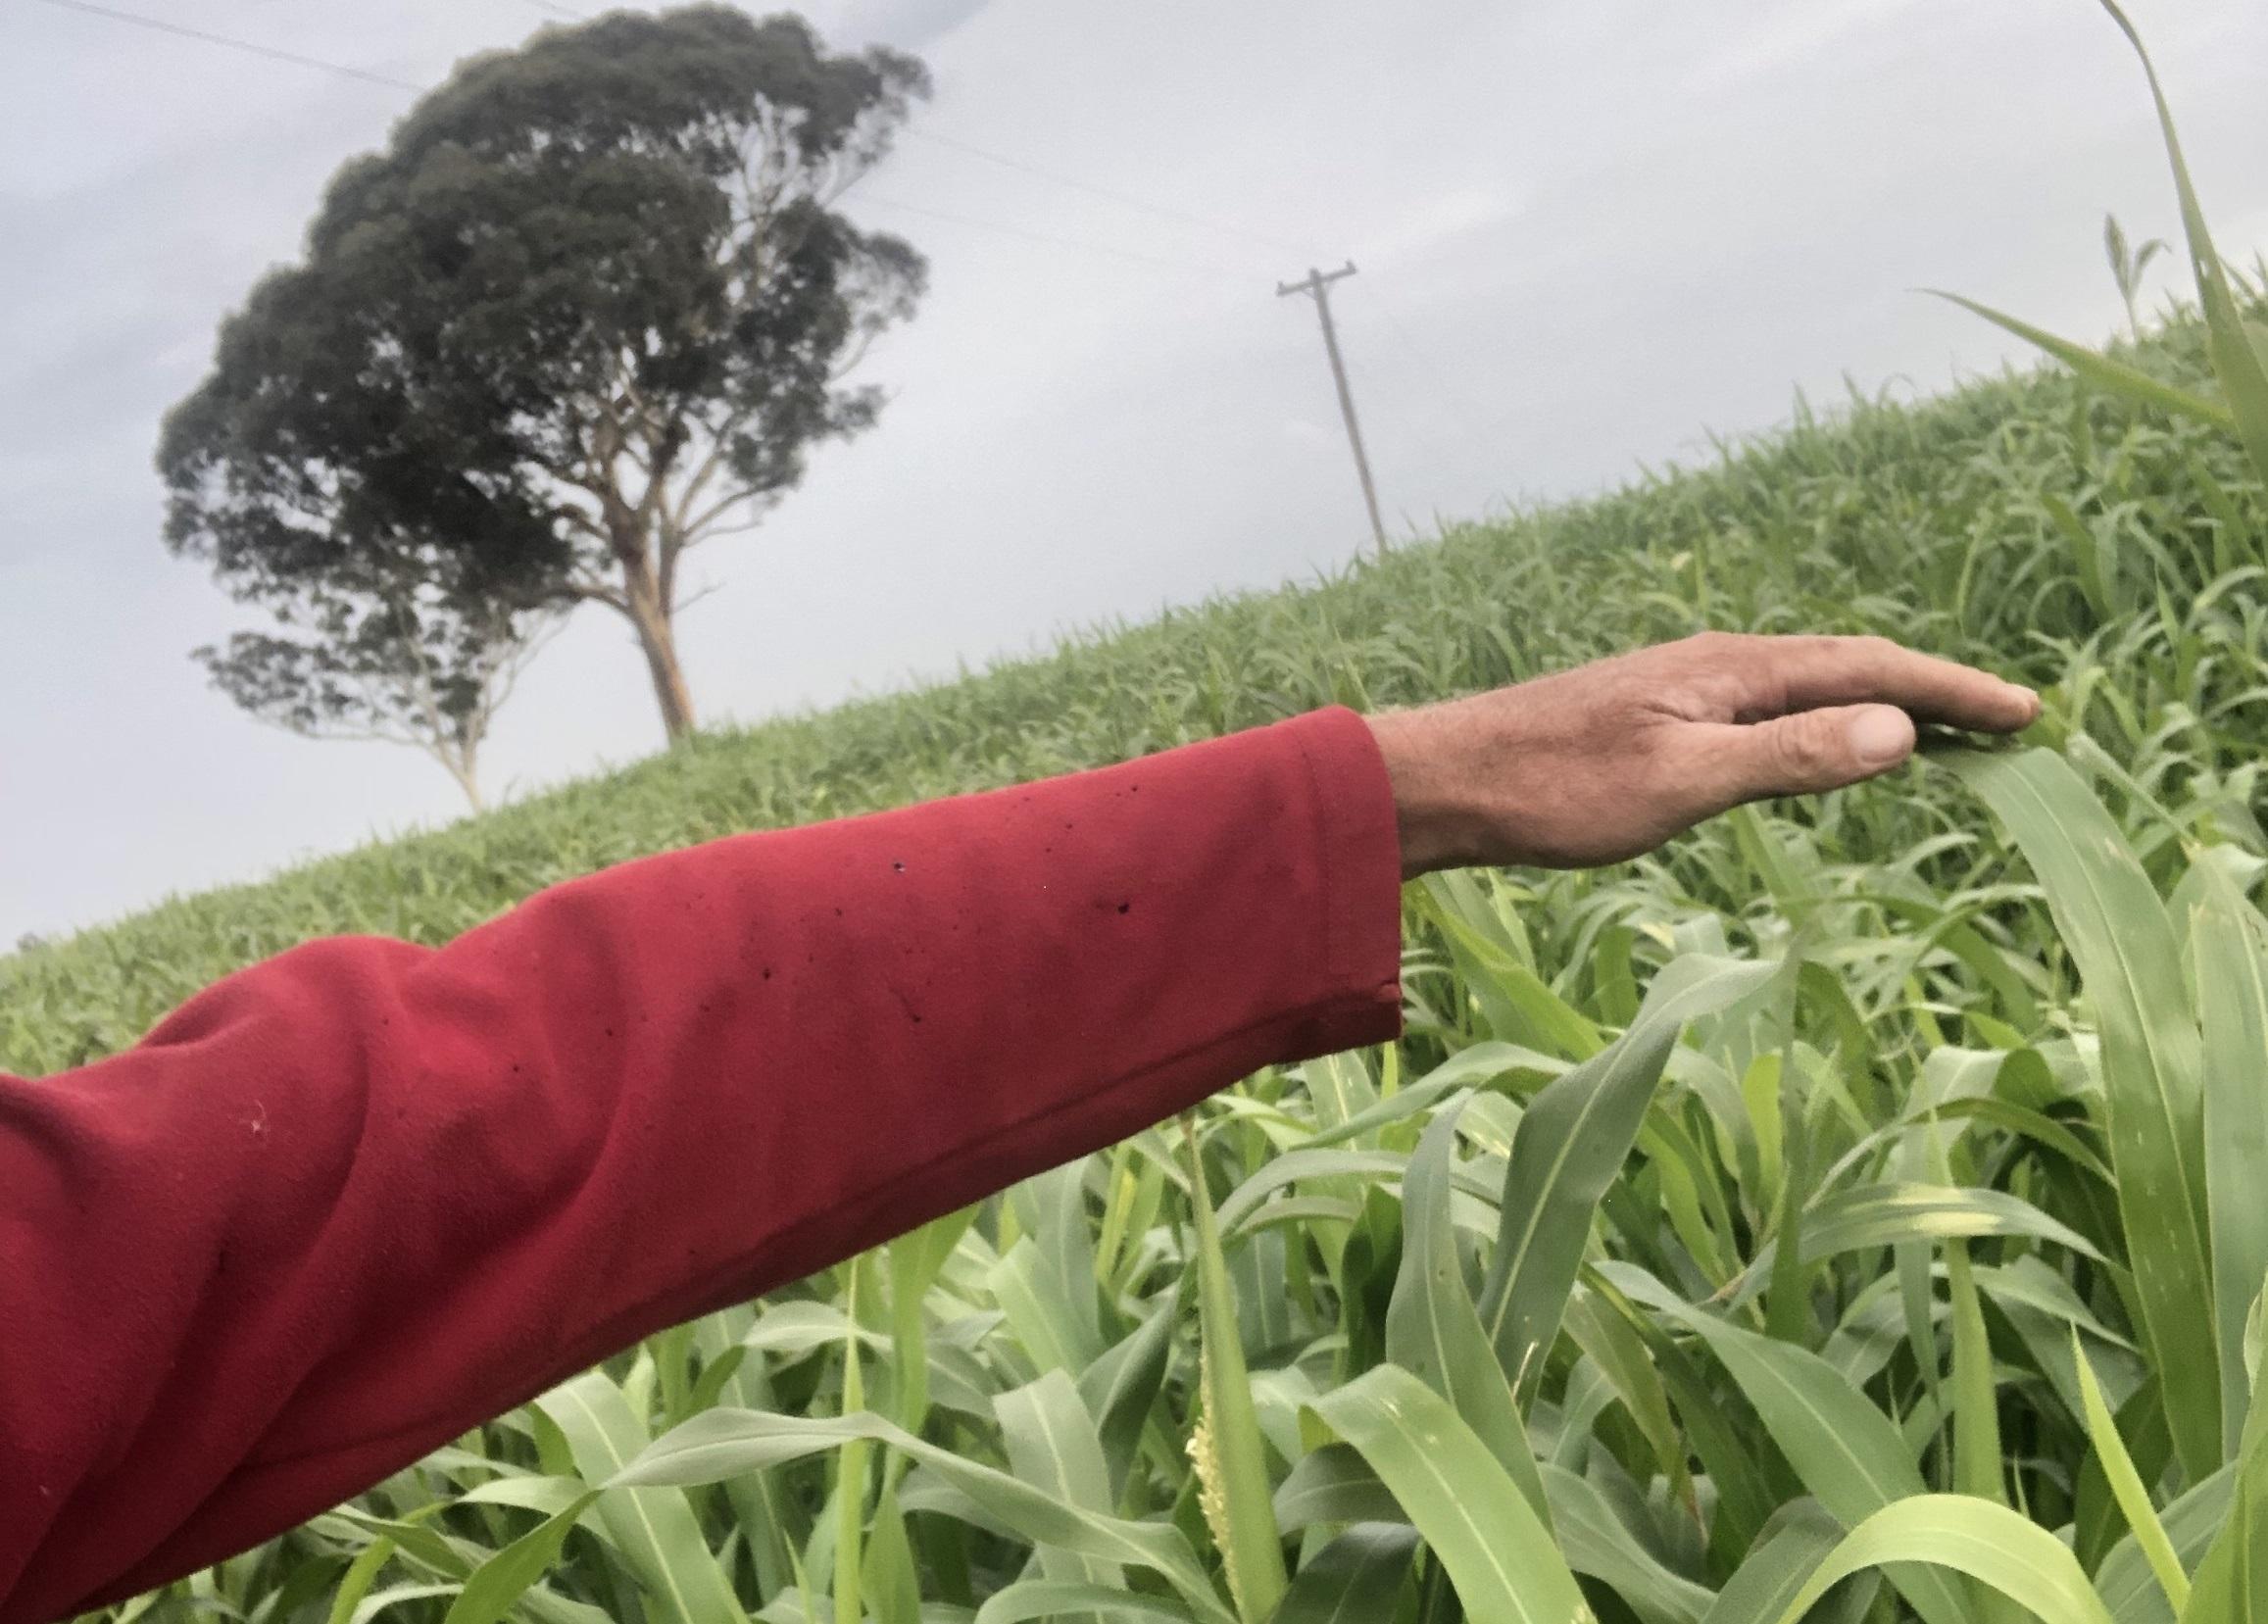 Soil Health and Soil Carbon